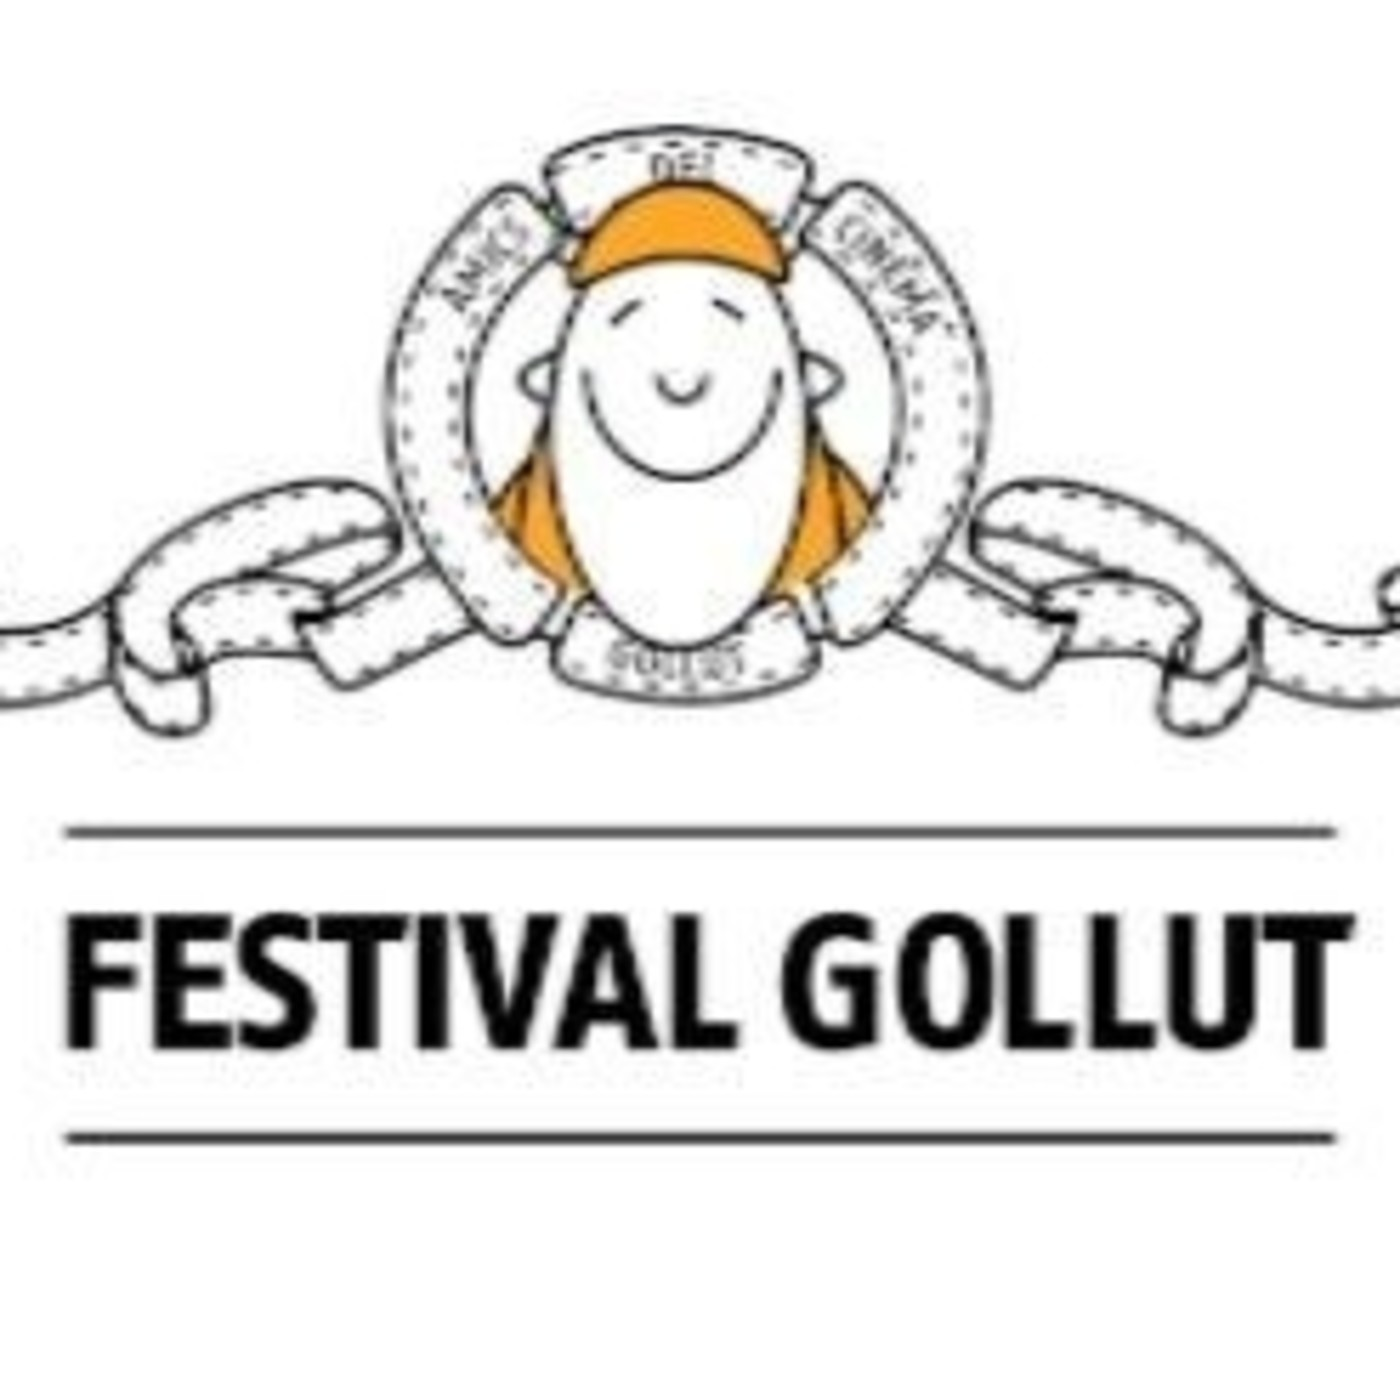 Terra Gollut Film Festival